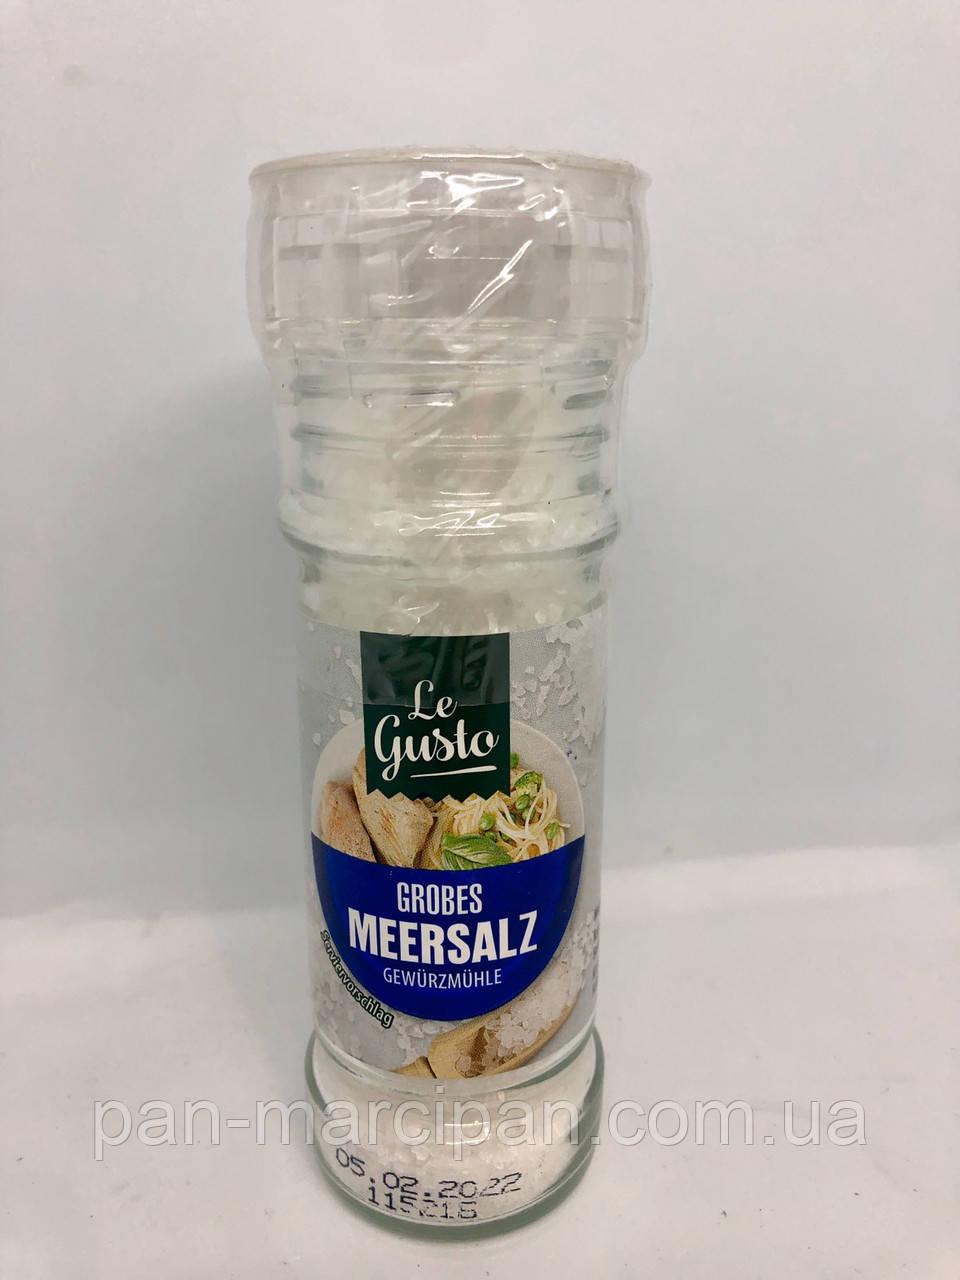 Морська сіль у млинку Le Gusto Grobes Meersalz 110г